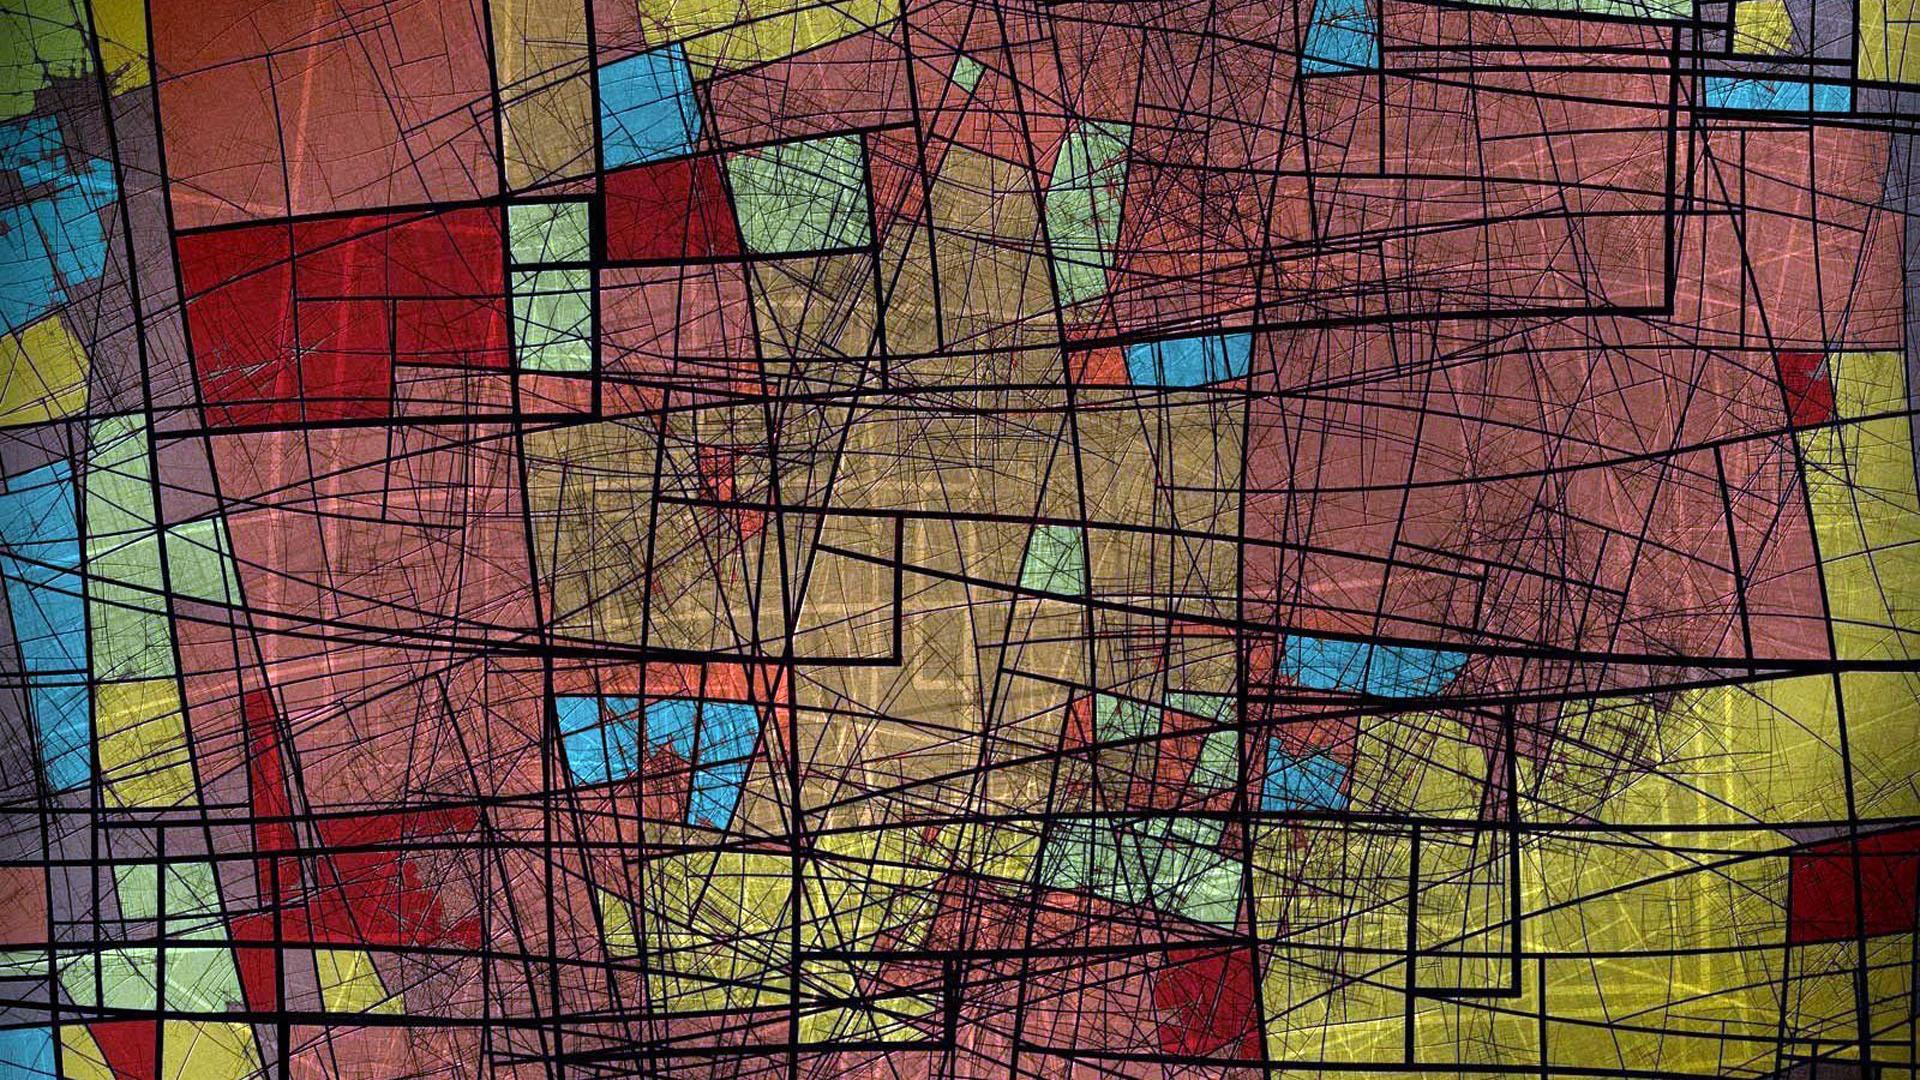 ... и картинки Кубизм скачать здесь: www.fullhdoboi.ru/photo/abstract/kubizm/22-0-23843